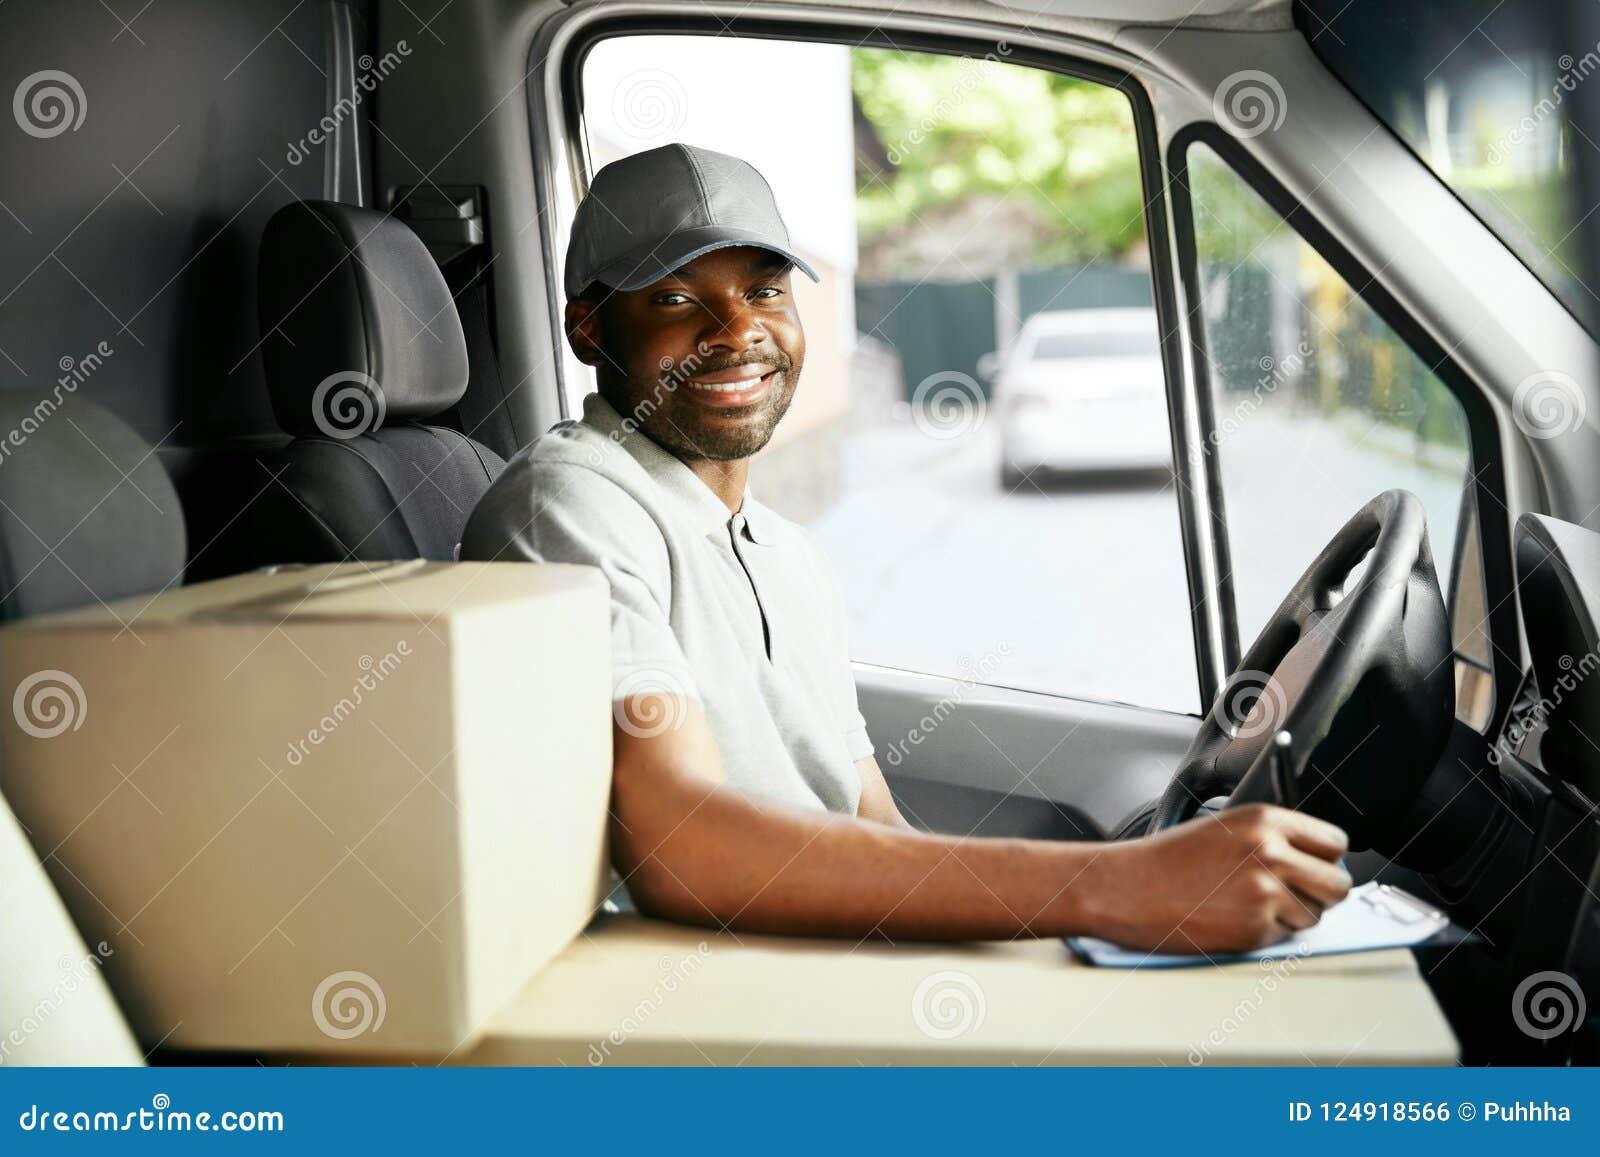 Kurir Delivery Svart manchaufför Driving Delivery Car